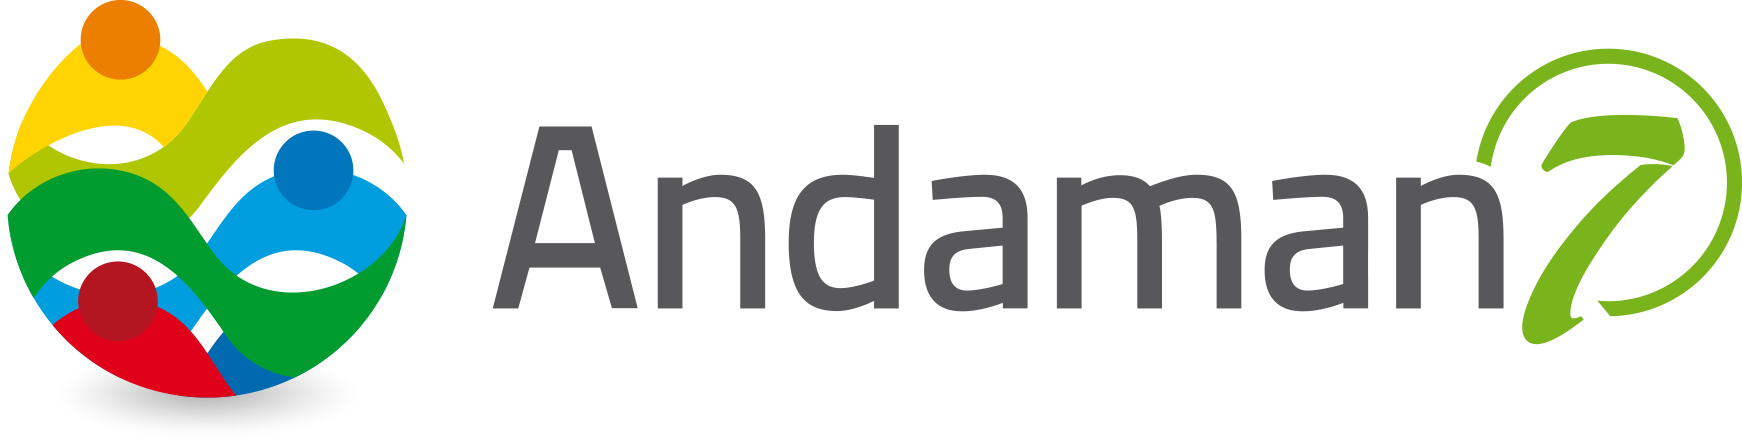 Andaman7 logo